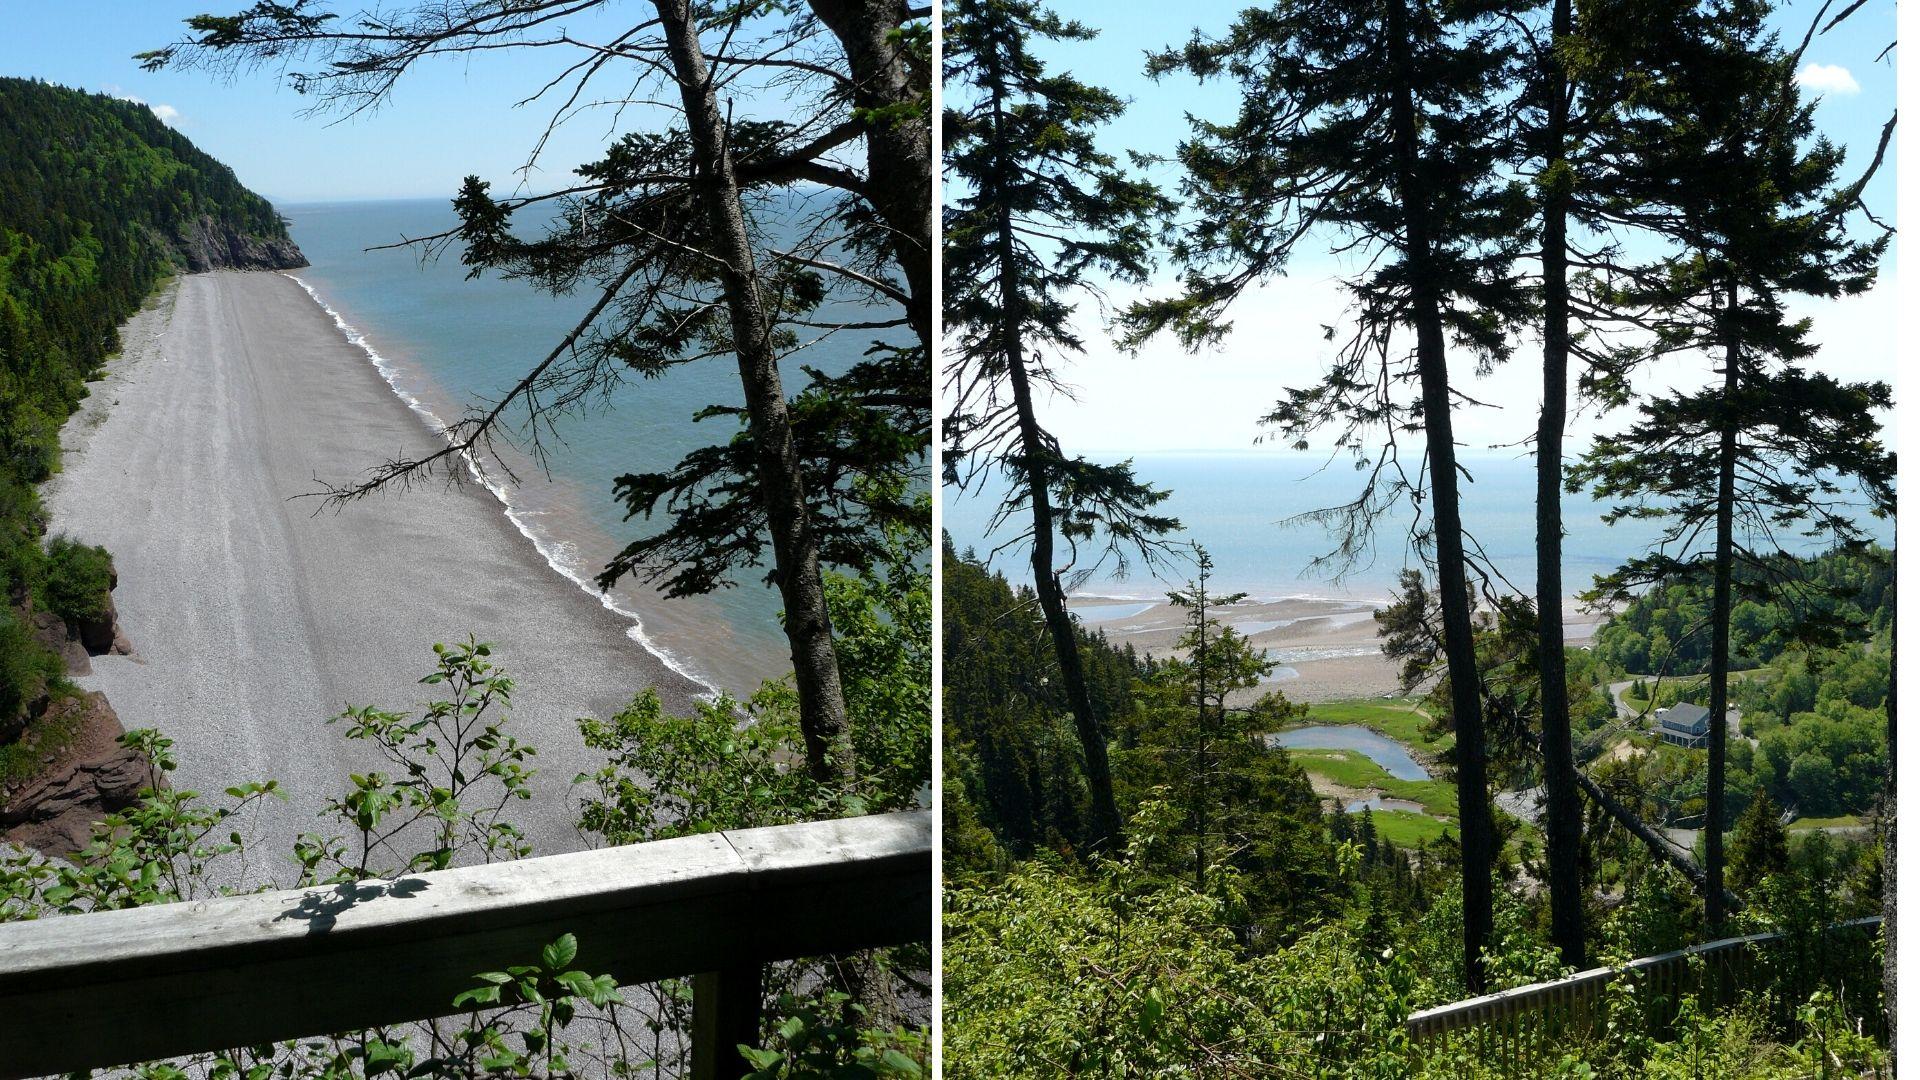 St. Martins - Fundy Trail Parkway - Nouveau-Brunswick, Canada